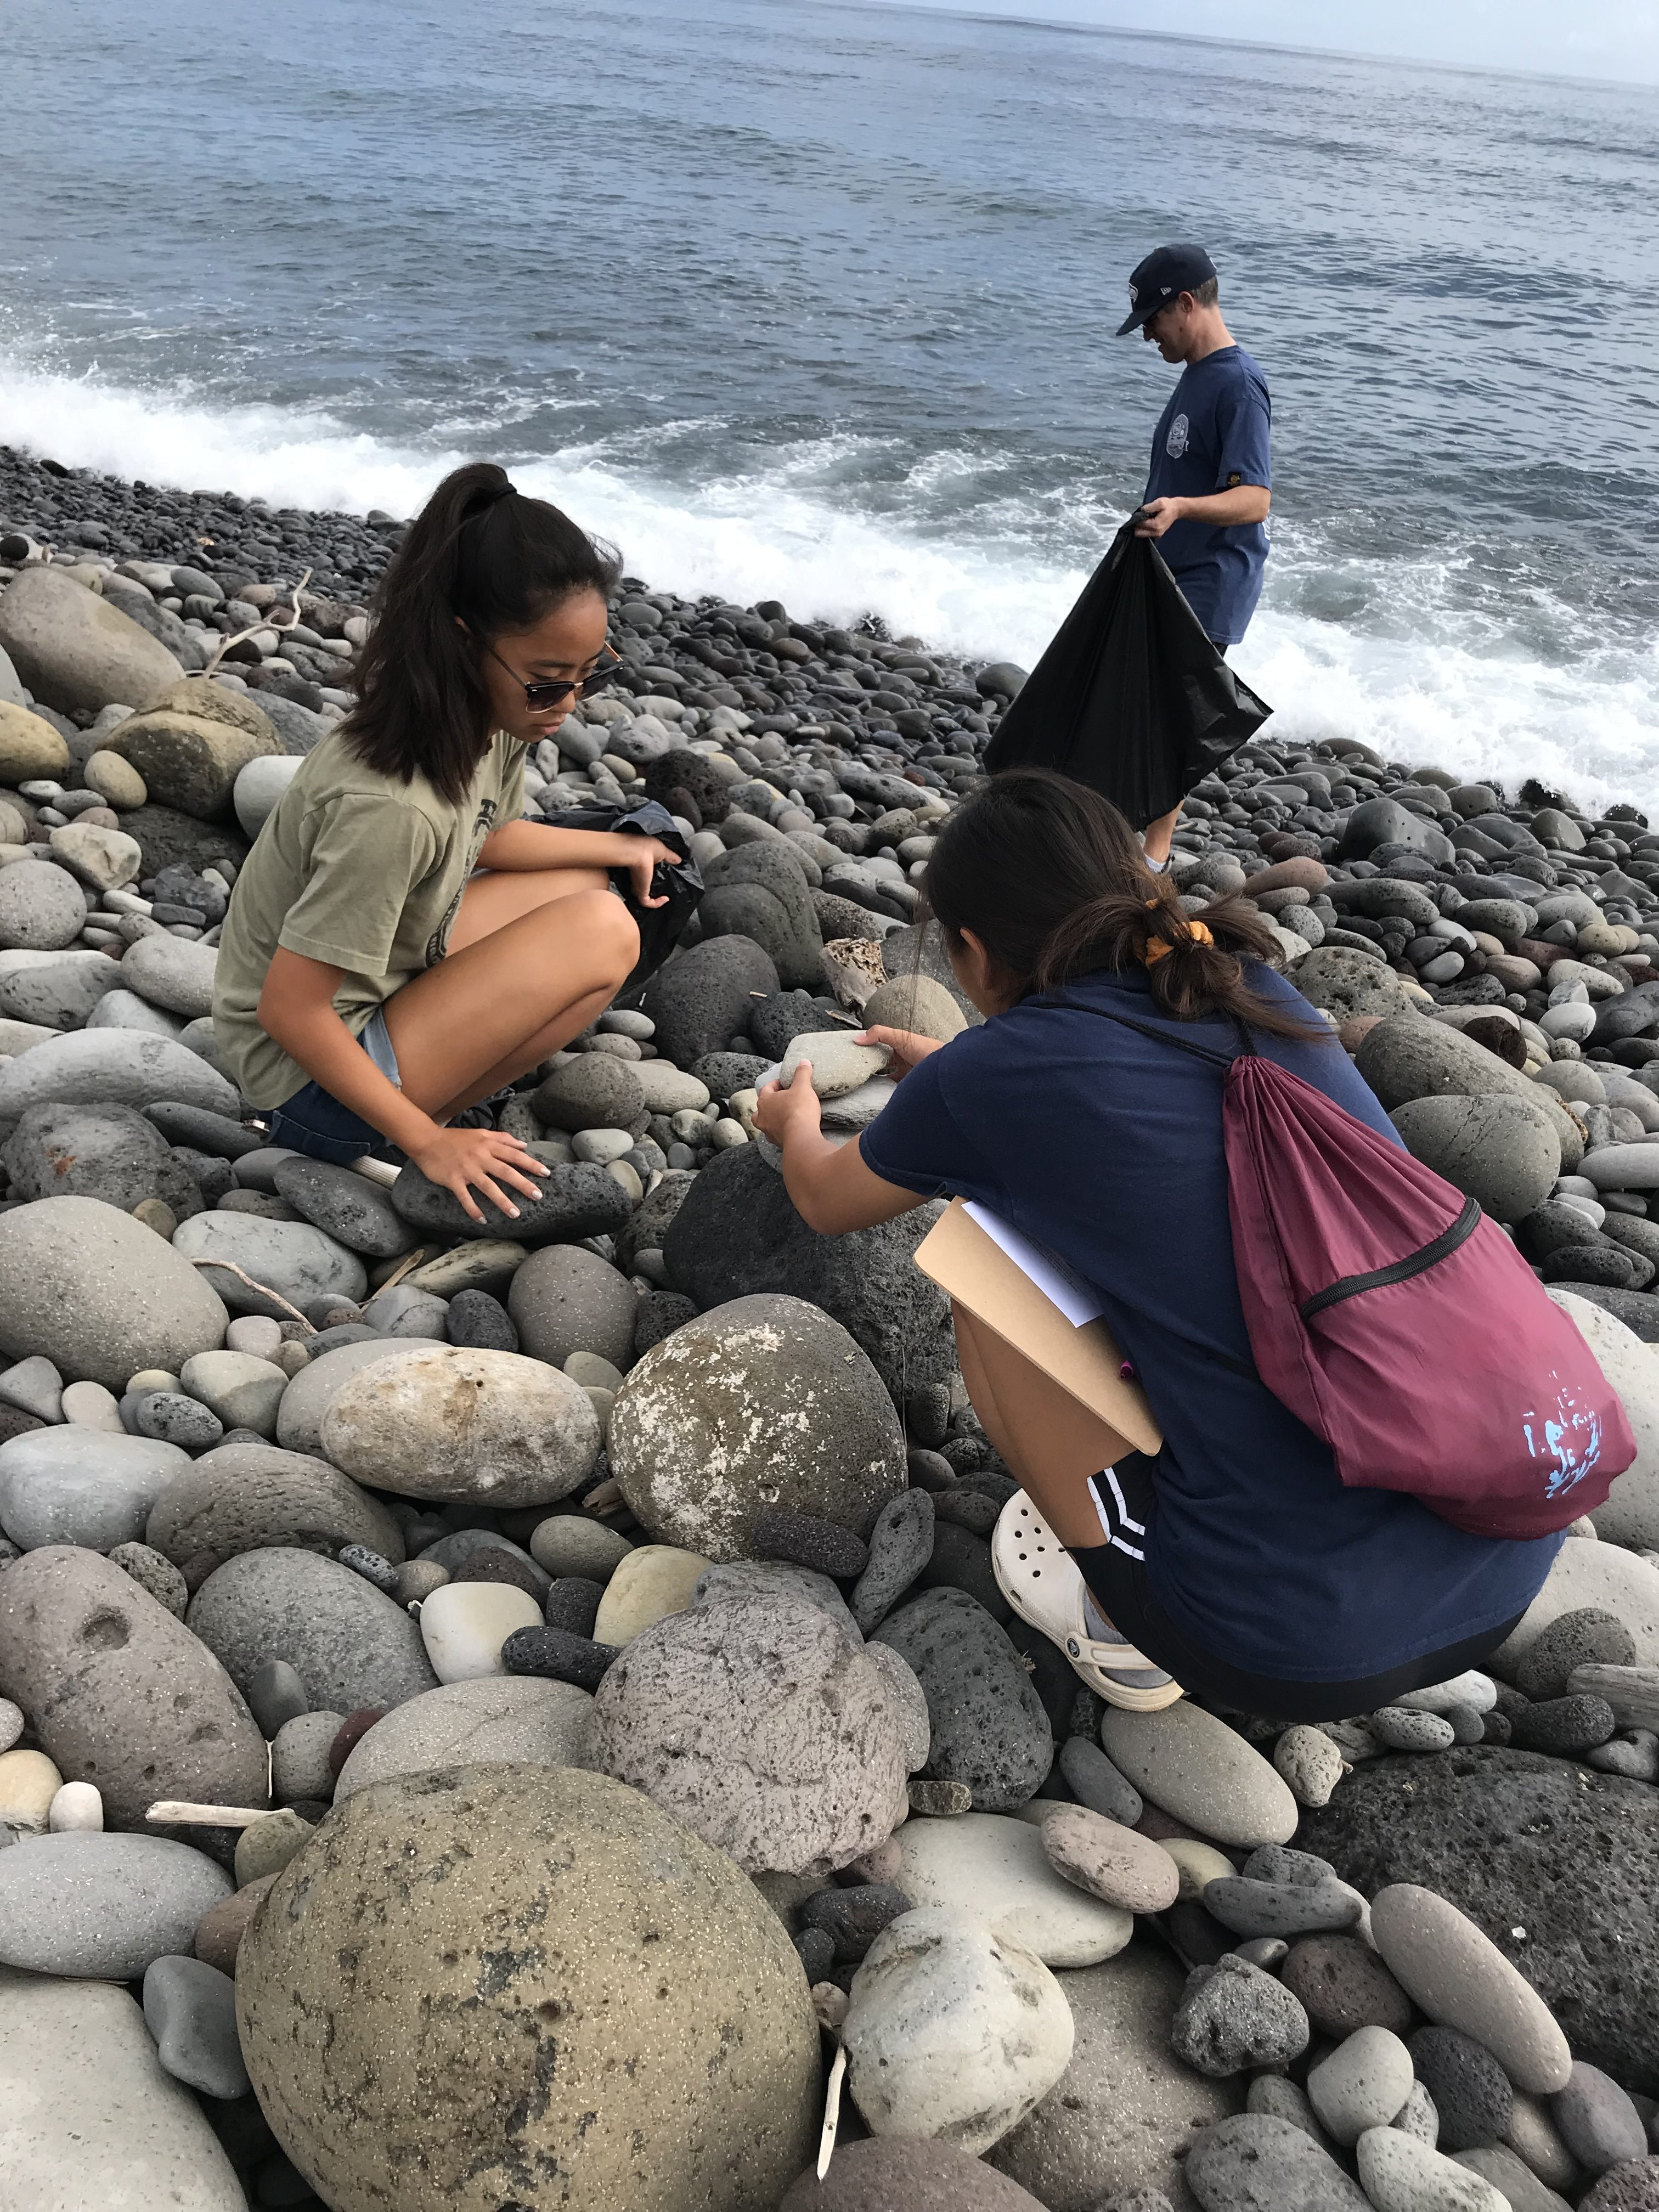 Bagging trash at 2019 Beach Clean Up